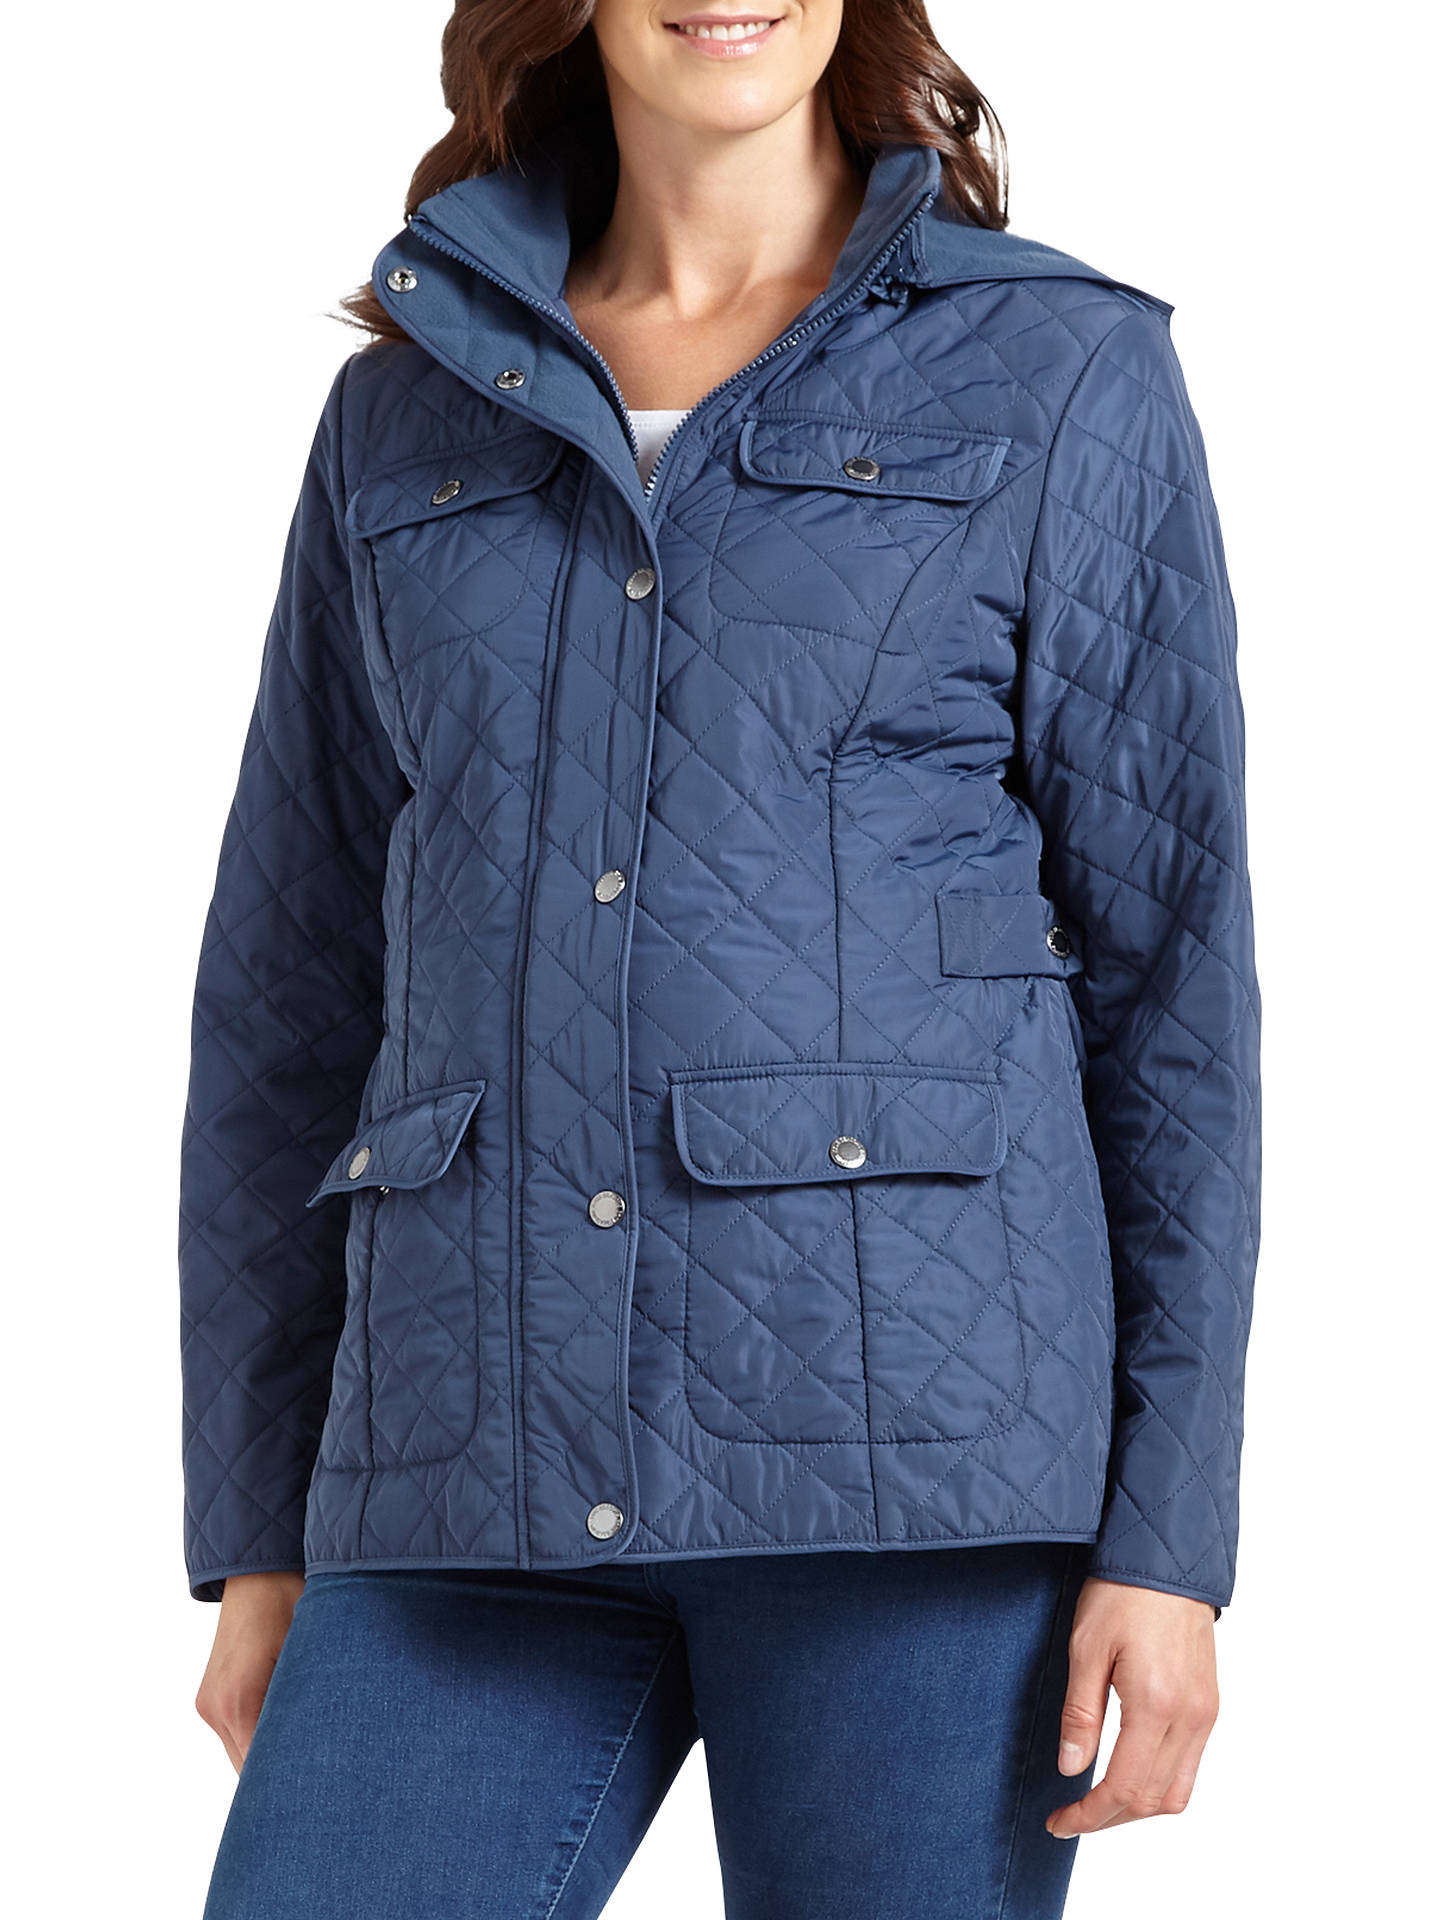 8a04b0b6818 Four Seasons Polar Quilted Fleece Jacket at John Lewis   Partners